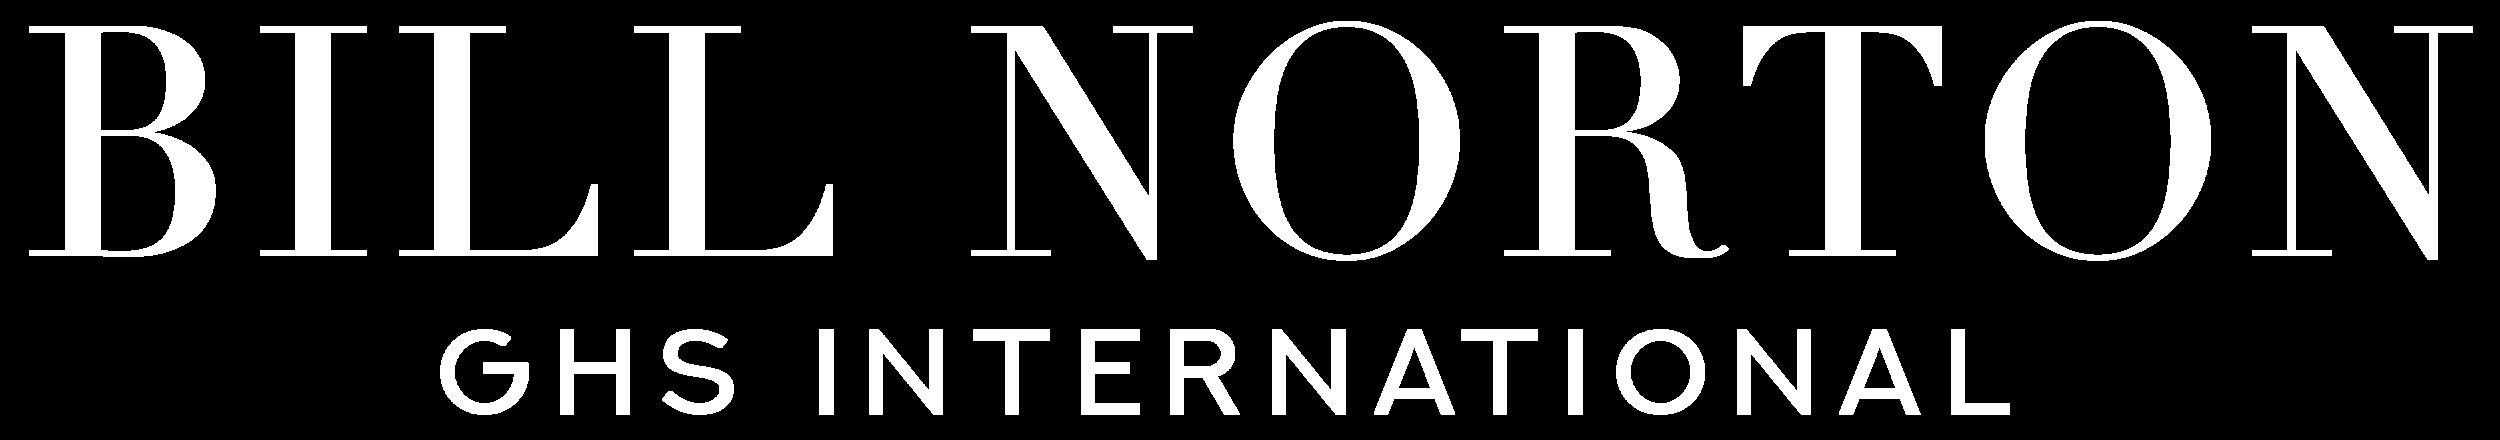 Bill Norton Logo.png